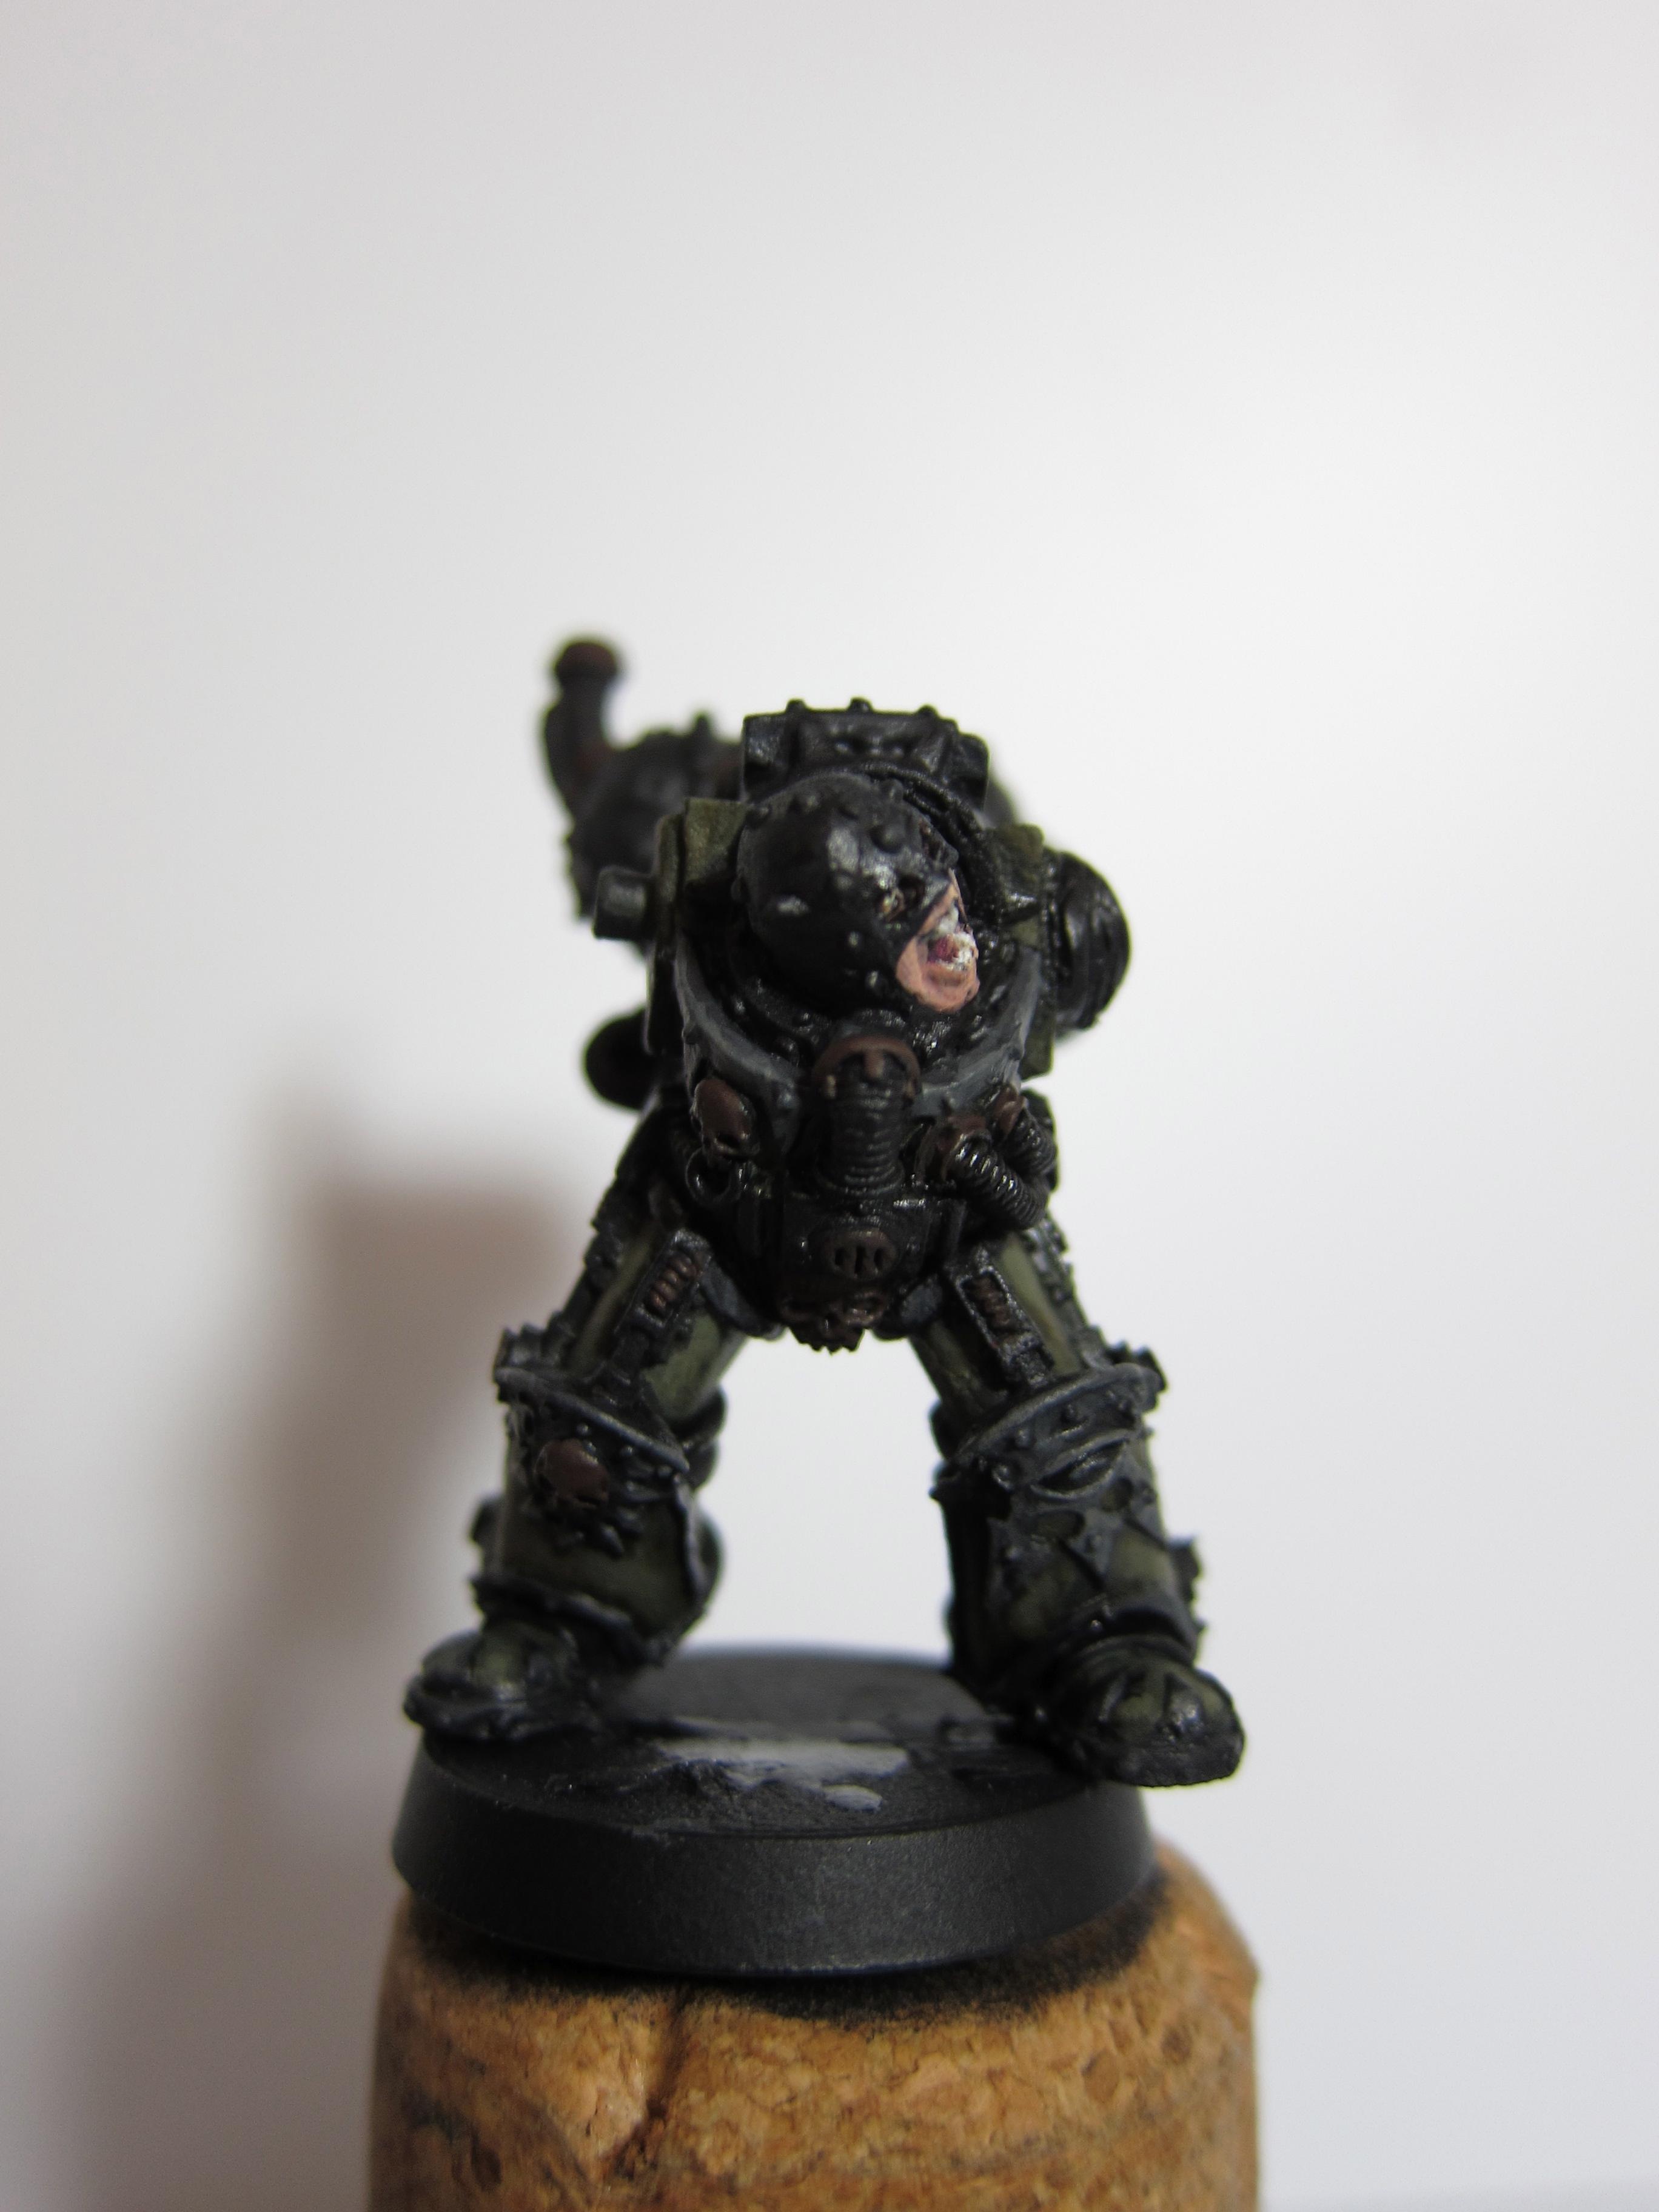 Cawdor, Chaos, Chaos Space Marines, Conversion, Death Guard, Necromunda, Nurgle, Painted, Plasma Cannon, Rust, Skave, Space Marines, Terminator Armor, The Purge, Warhammer 40,000